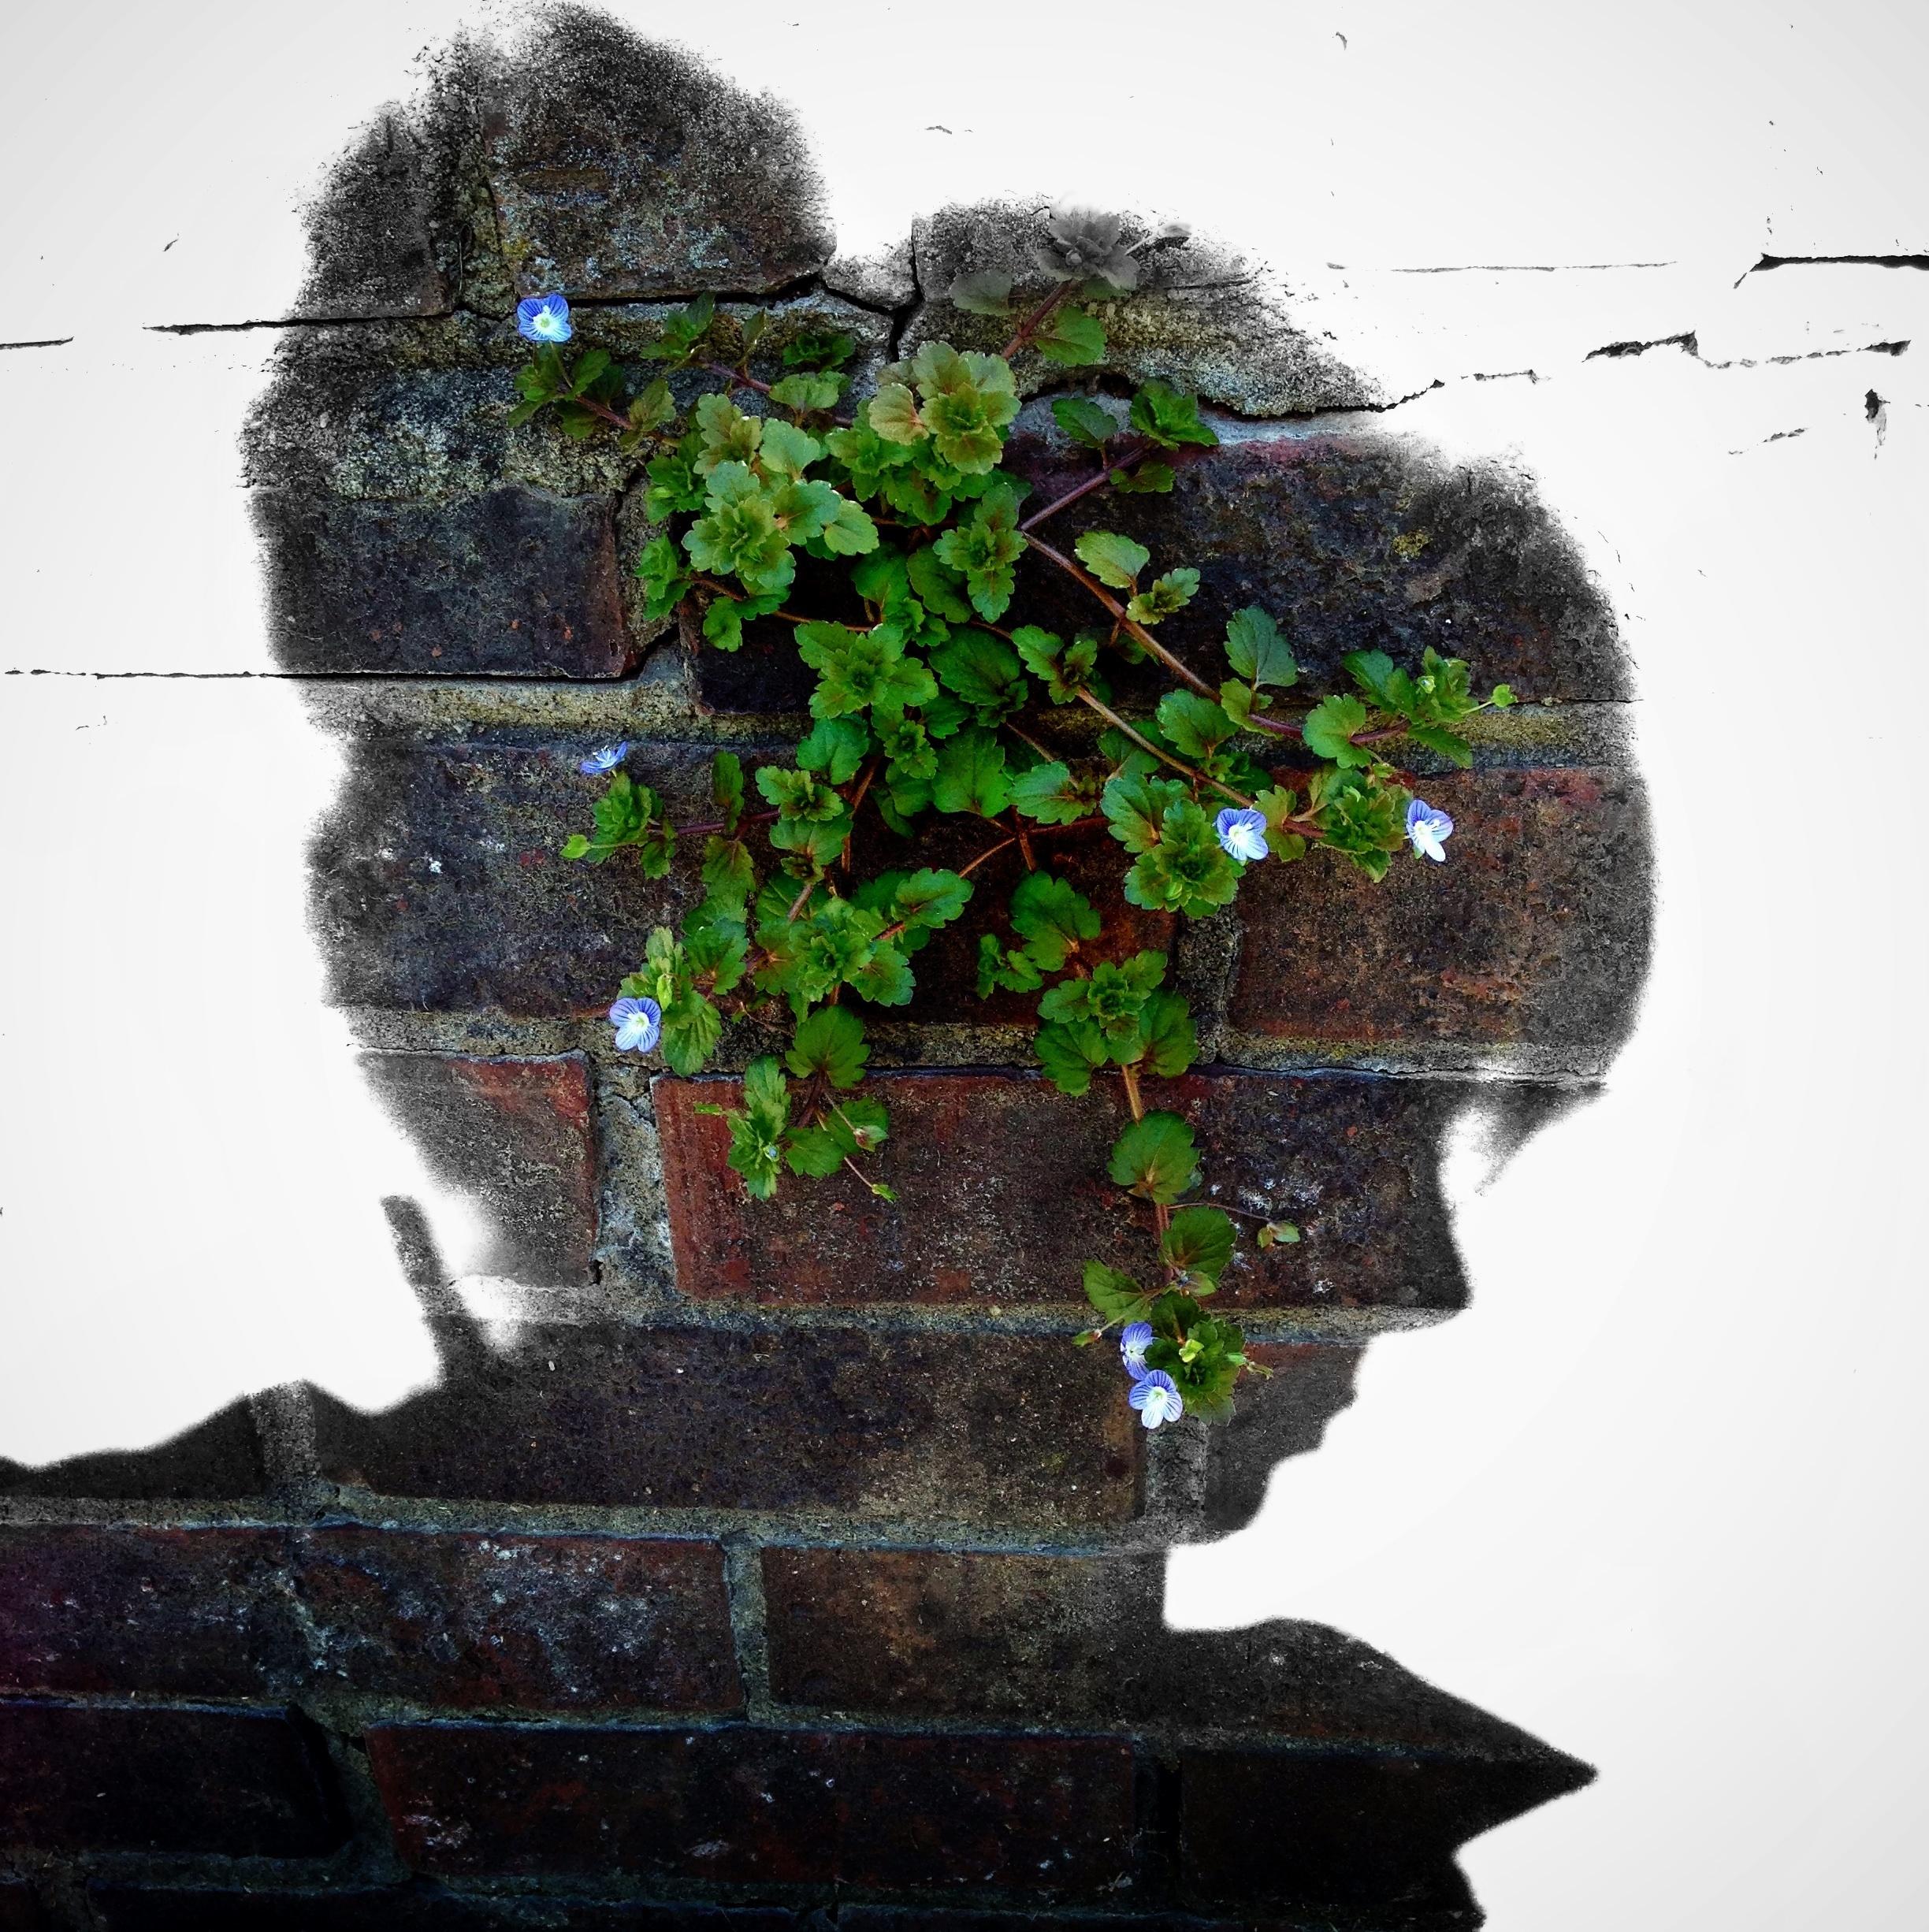 Jane Eyre 3: 'I Love Thornfield'